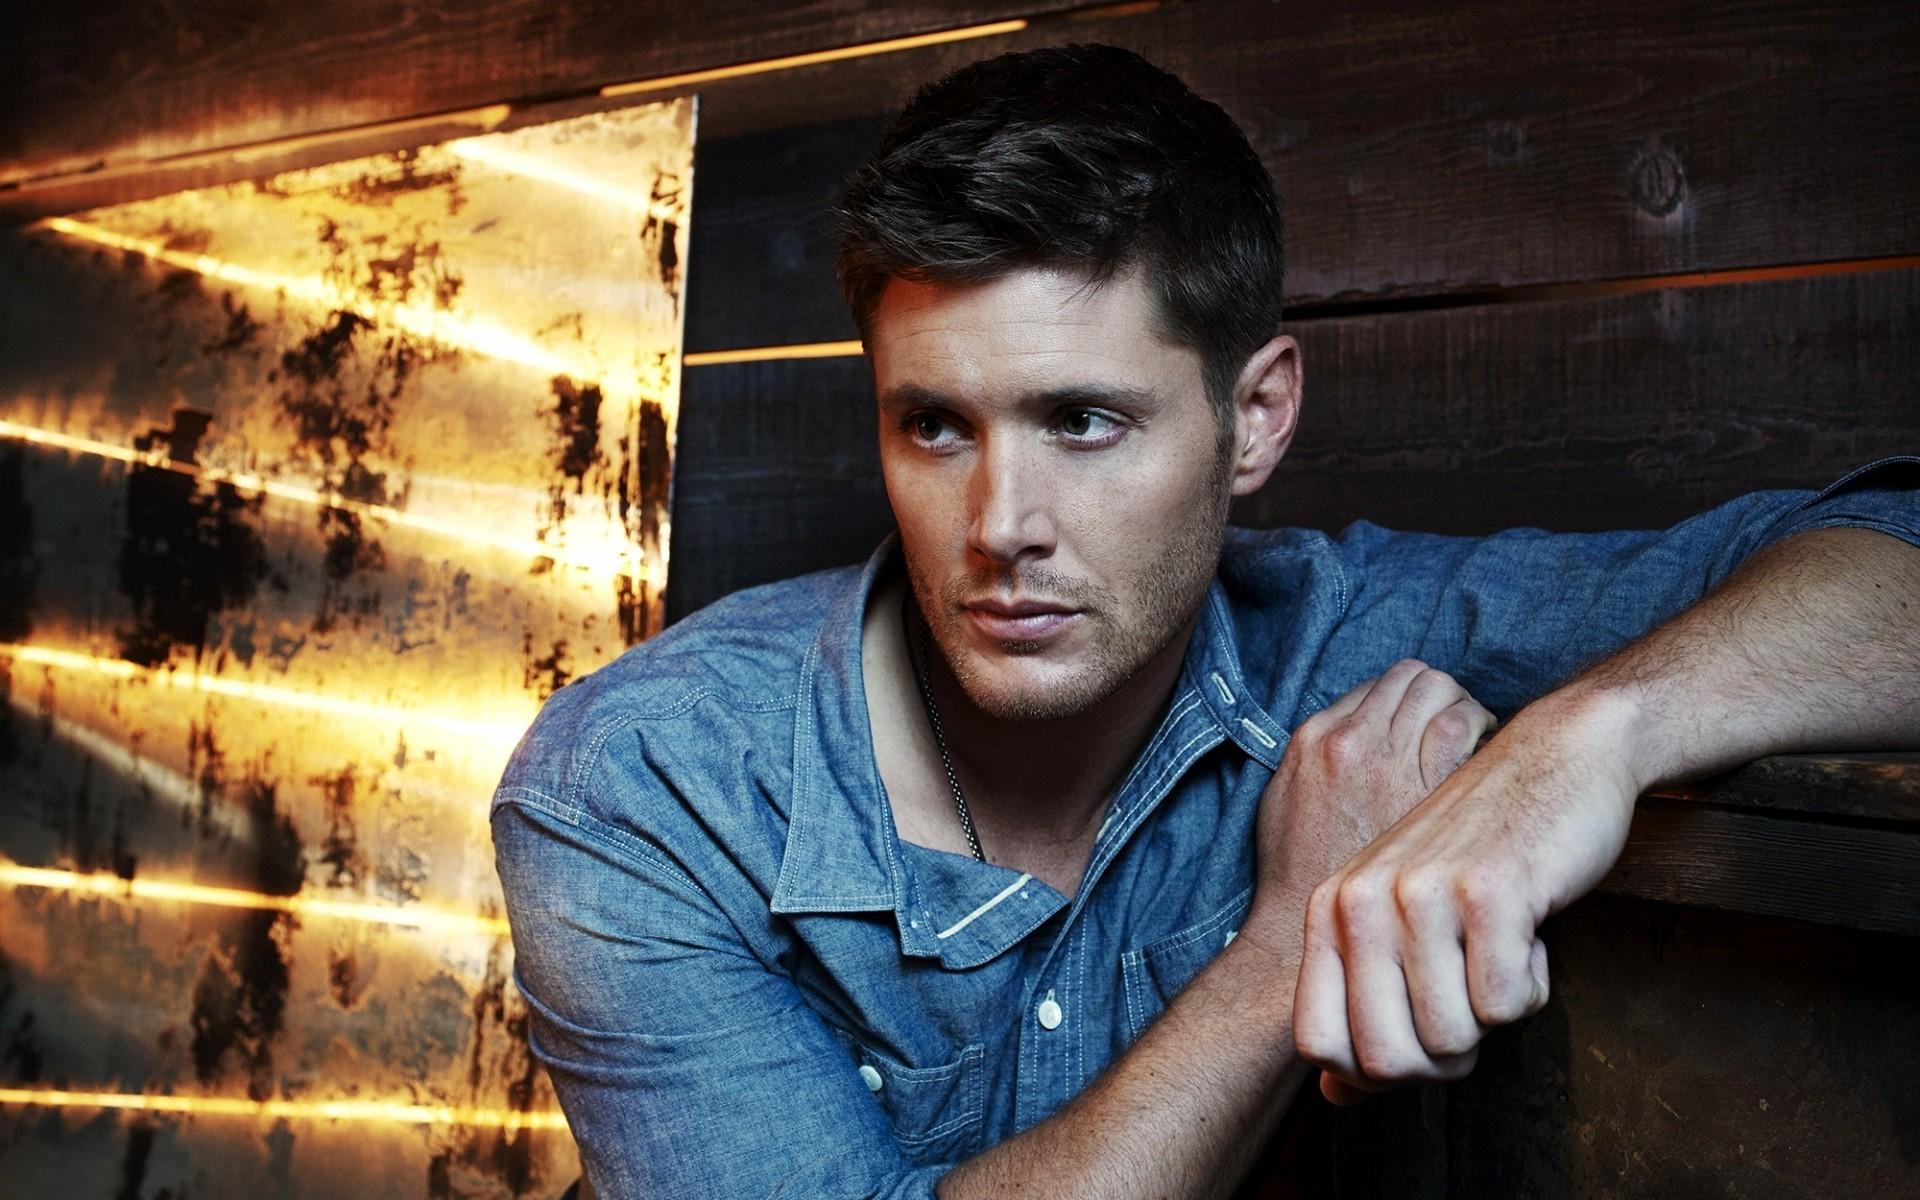 Jensen Ackles 2014 Photoshoot